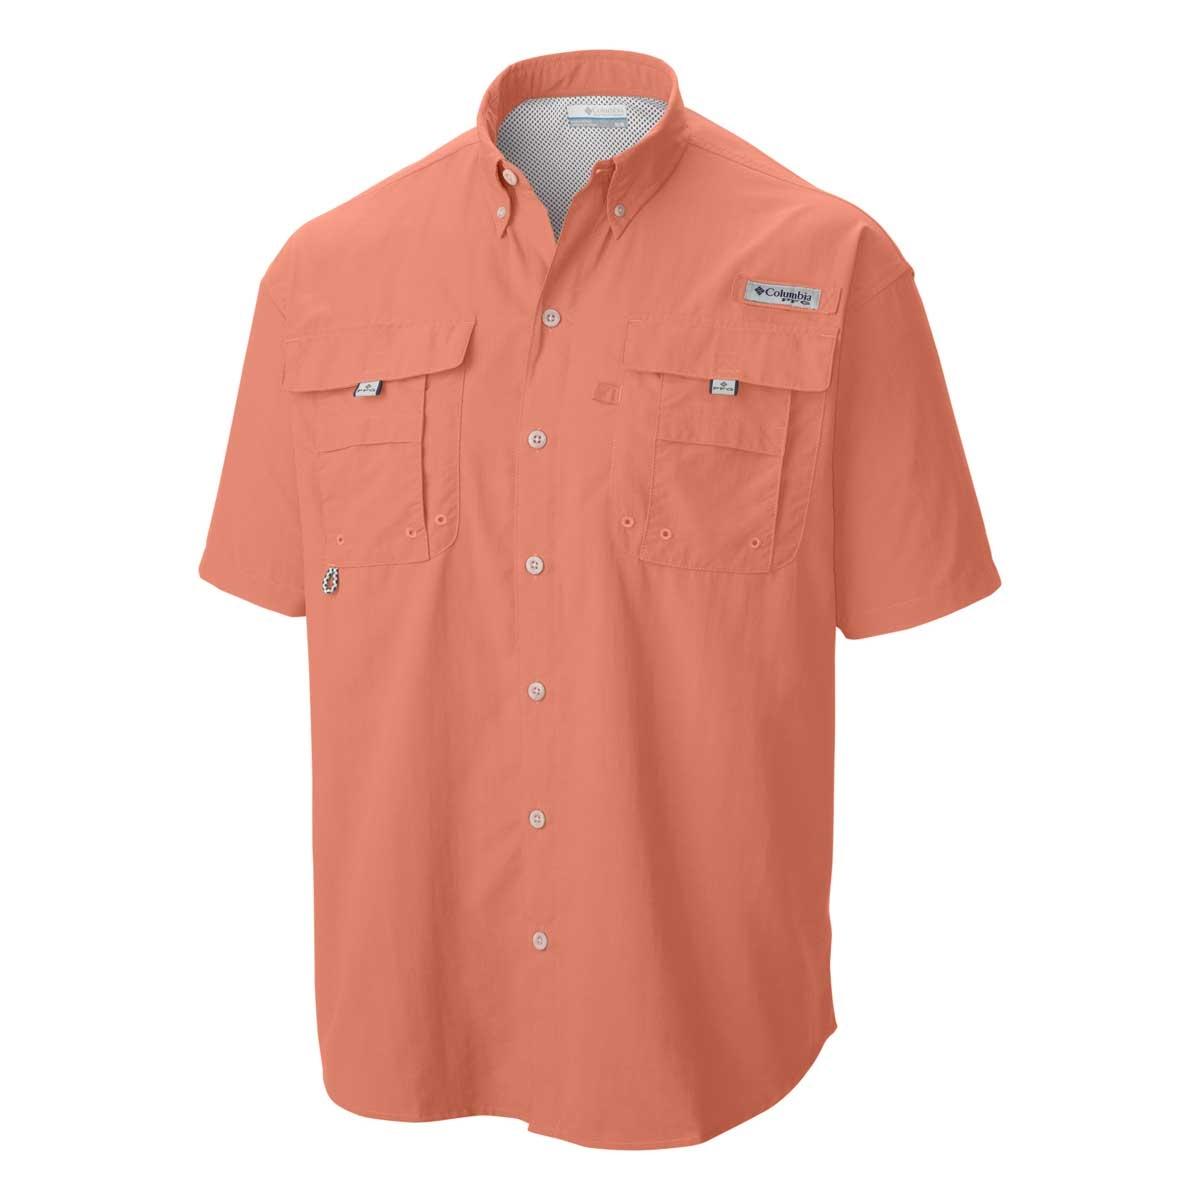 Columbia PFG Bahama Short Sleeve Shirt